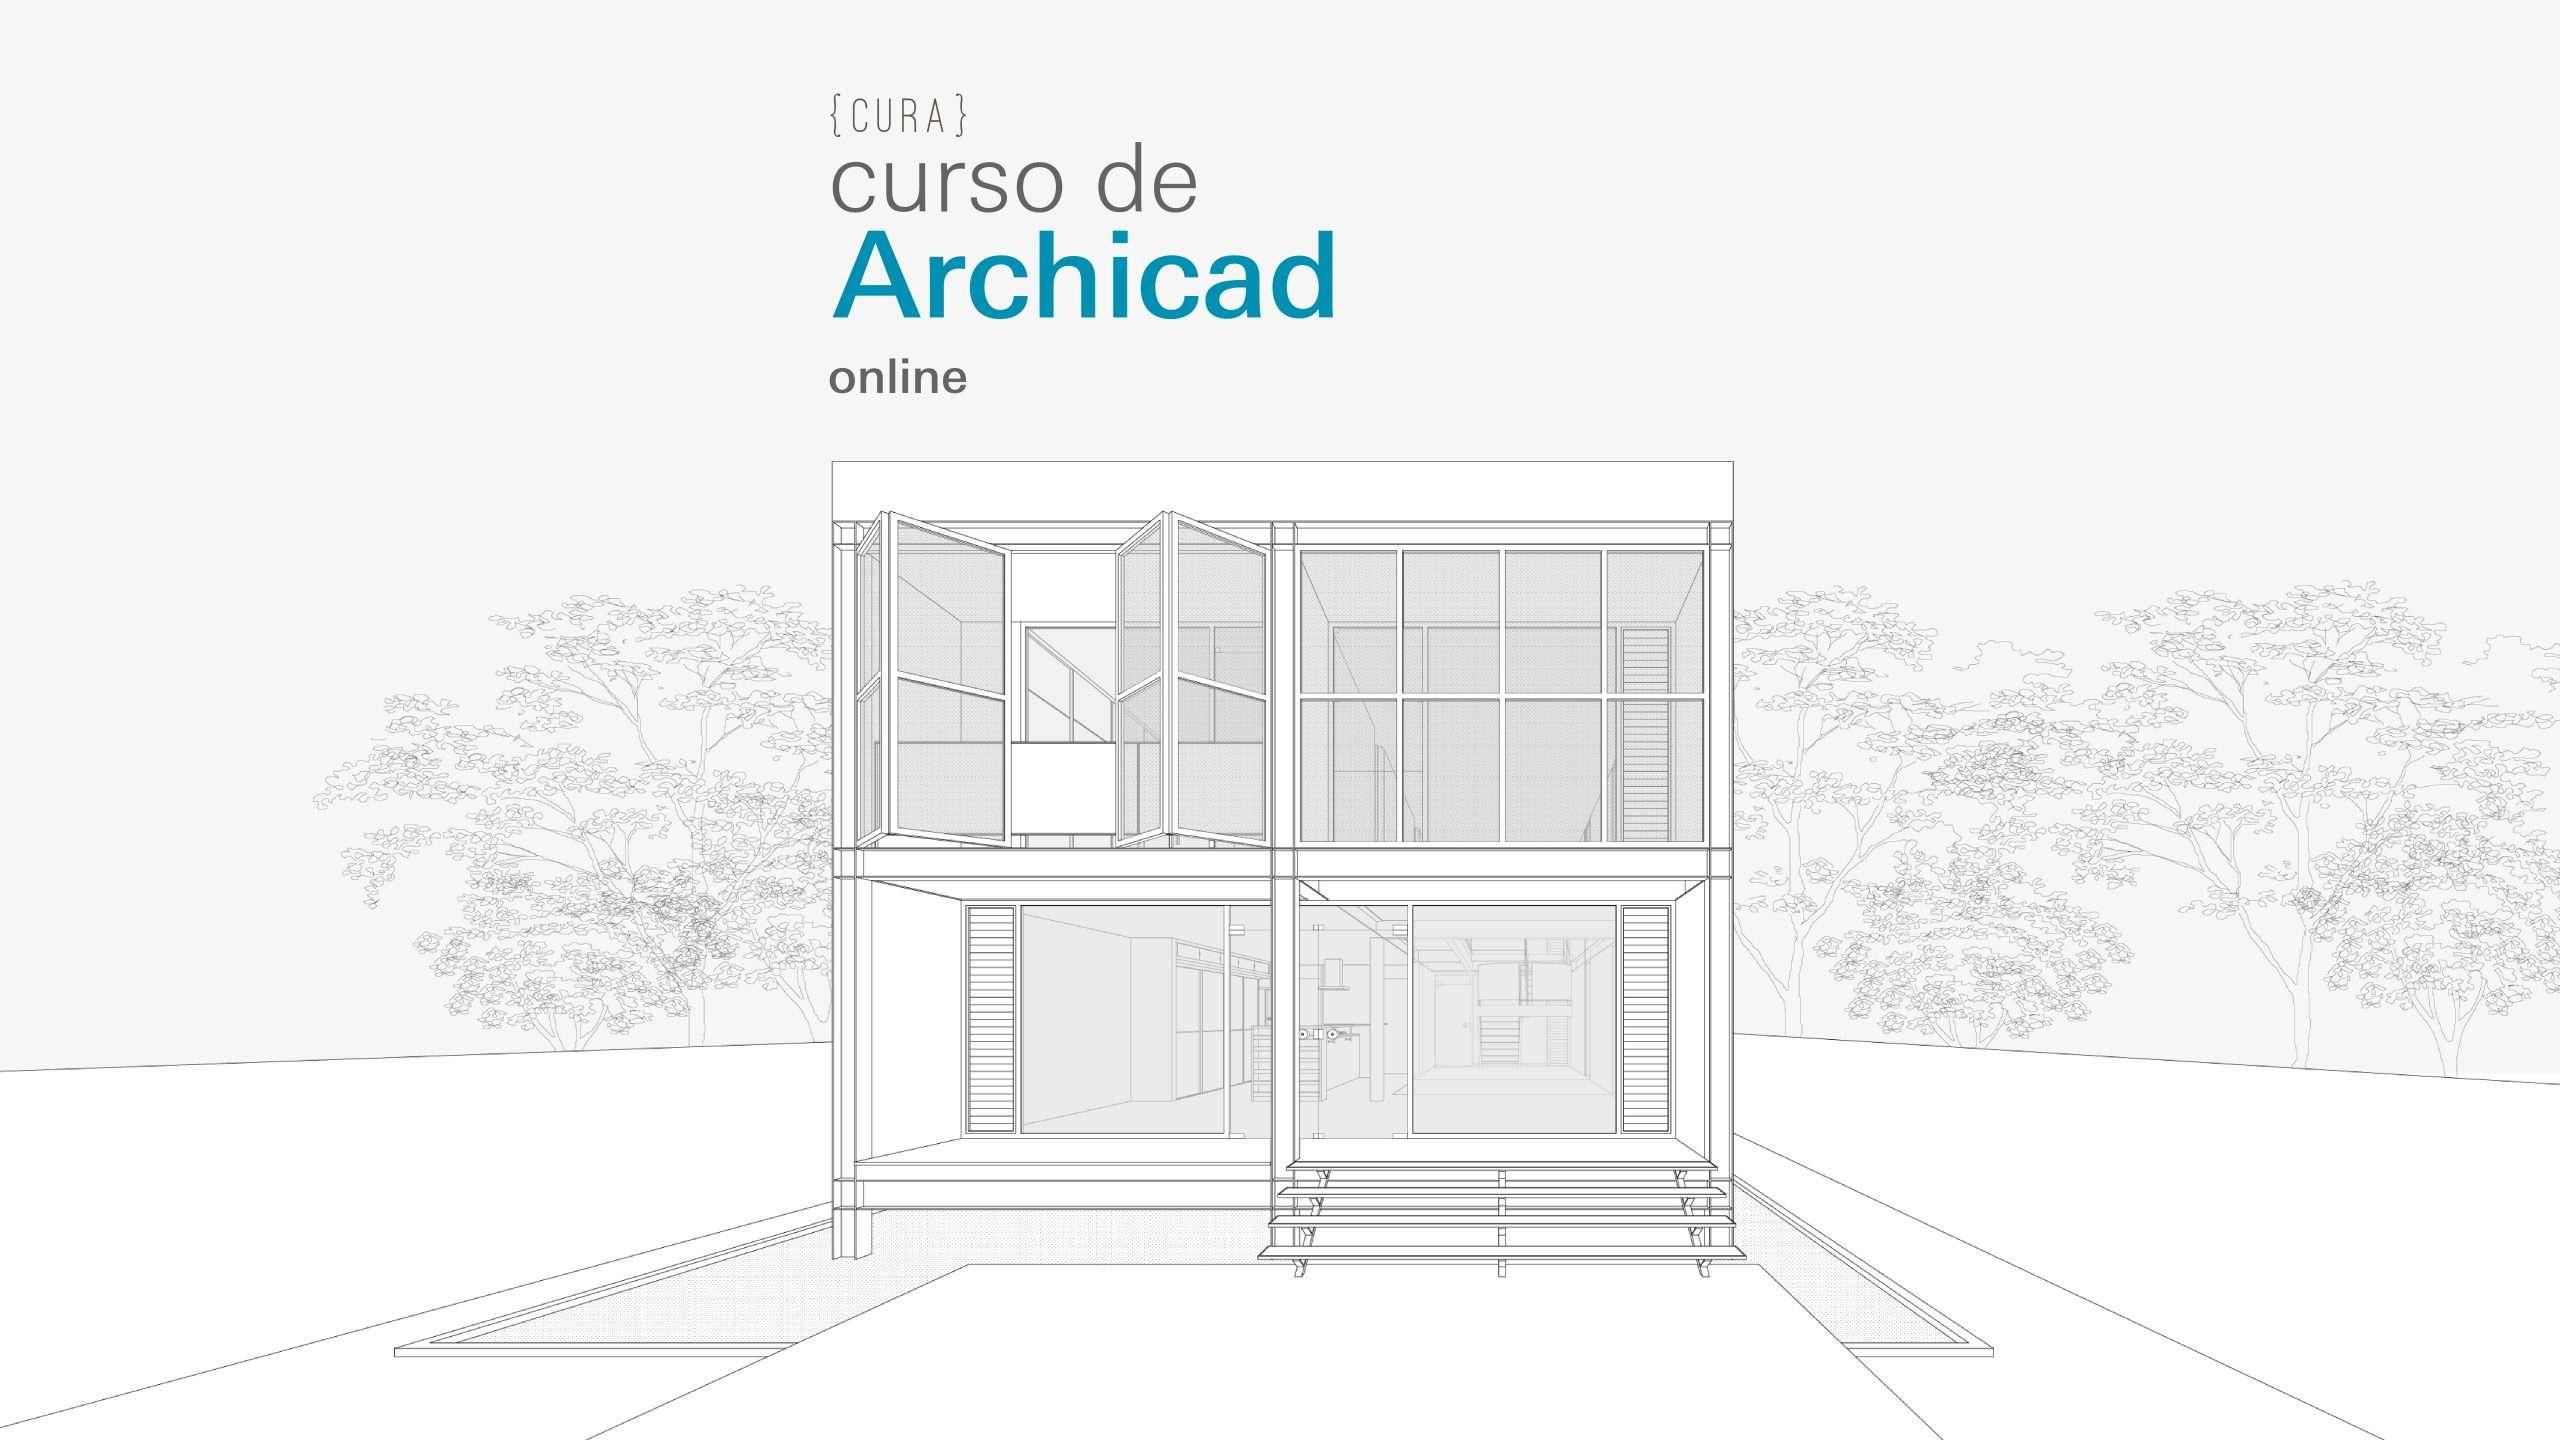 Archicad {CURA}   Online